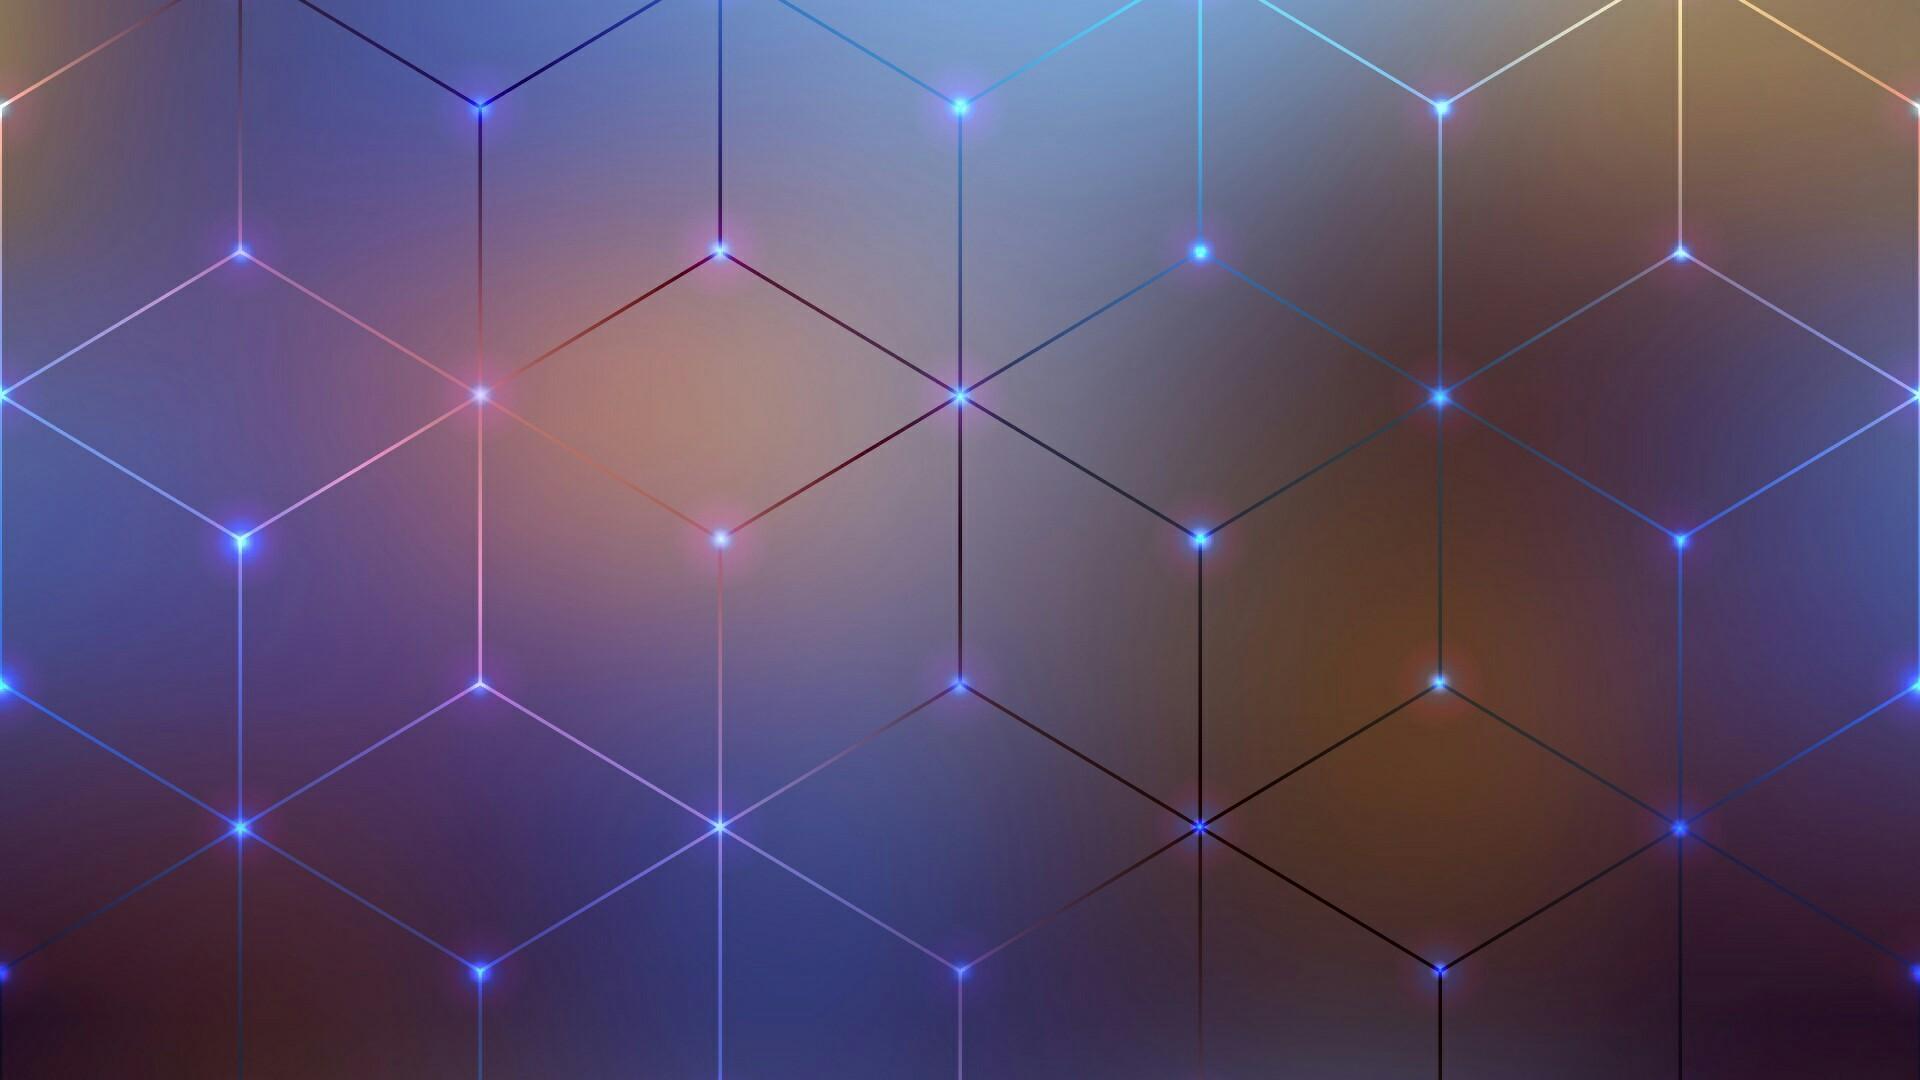 Translucent PC Wallpaper HD